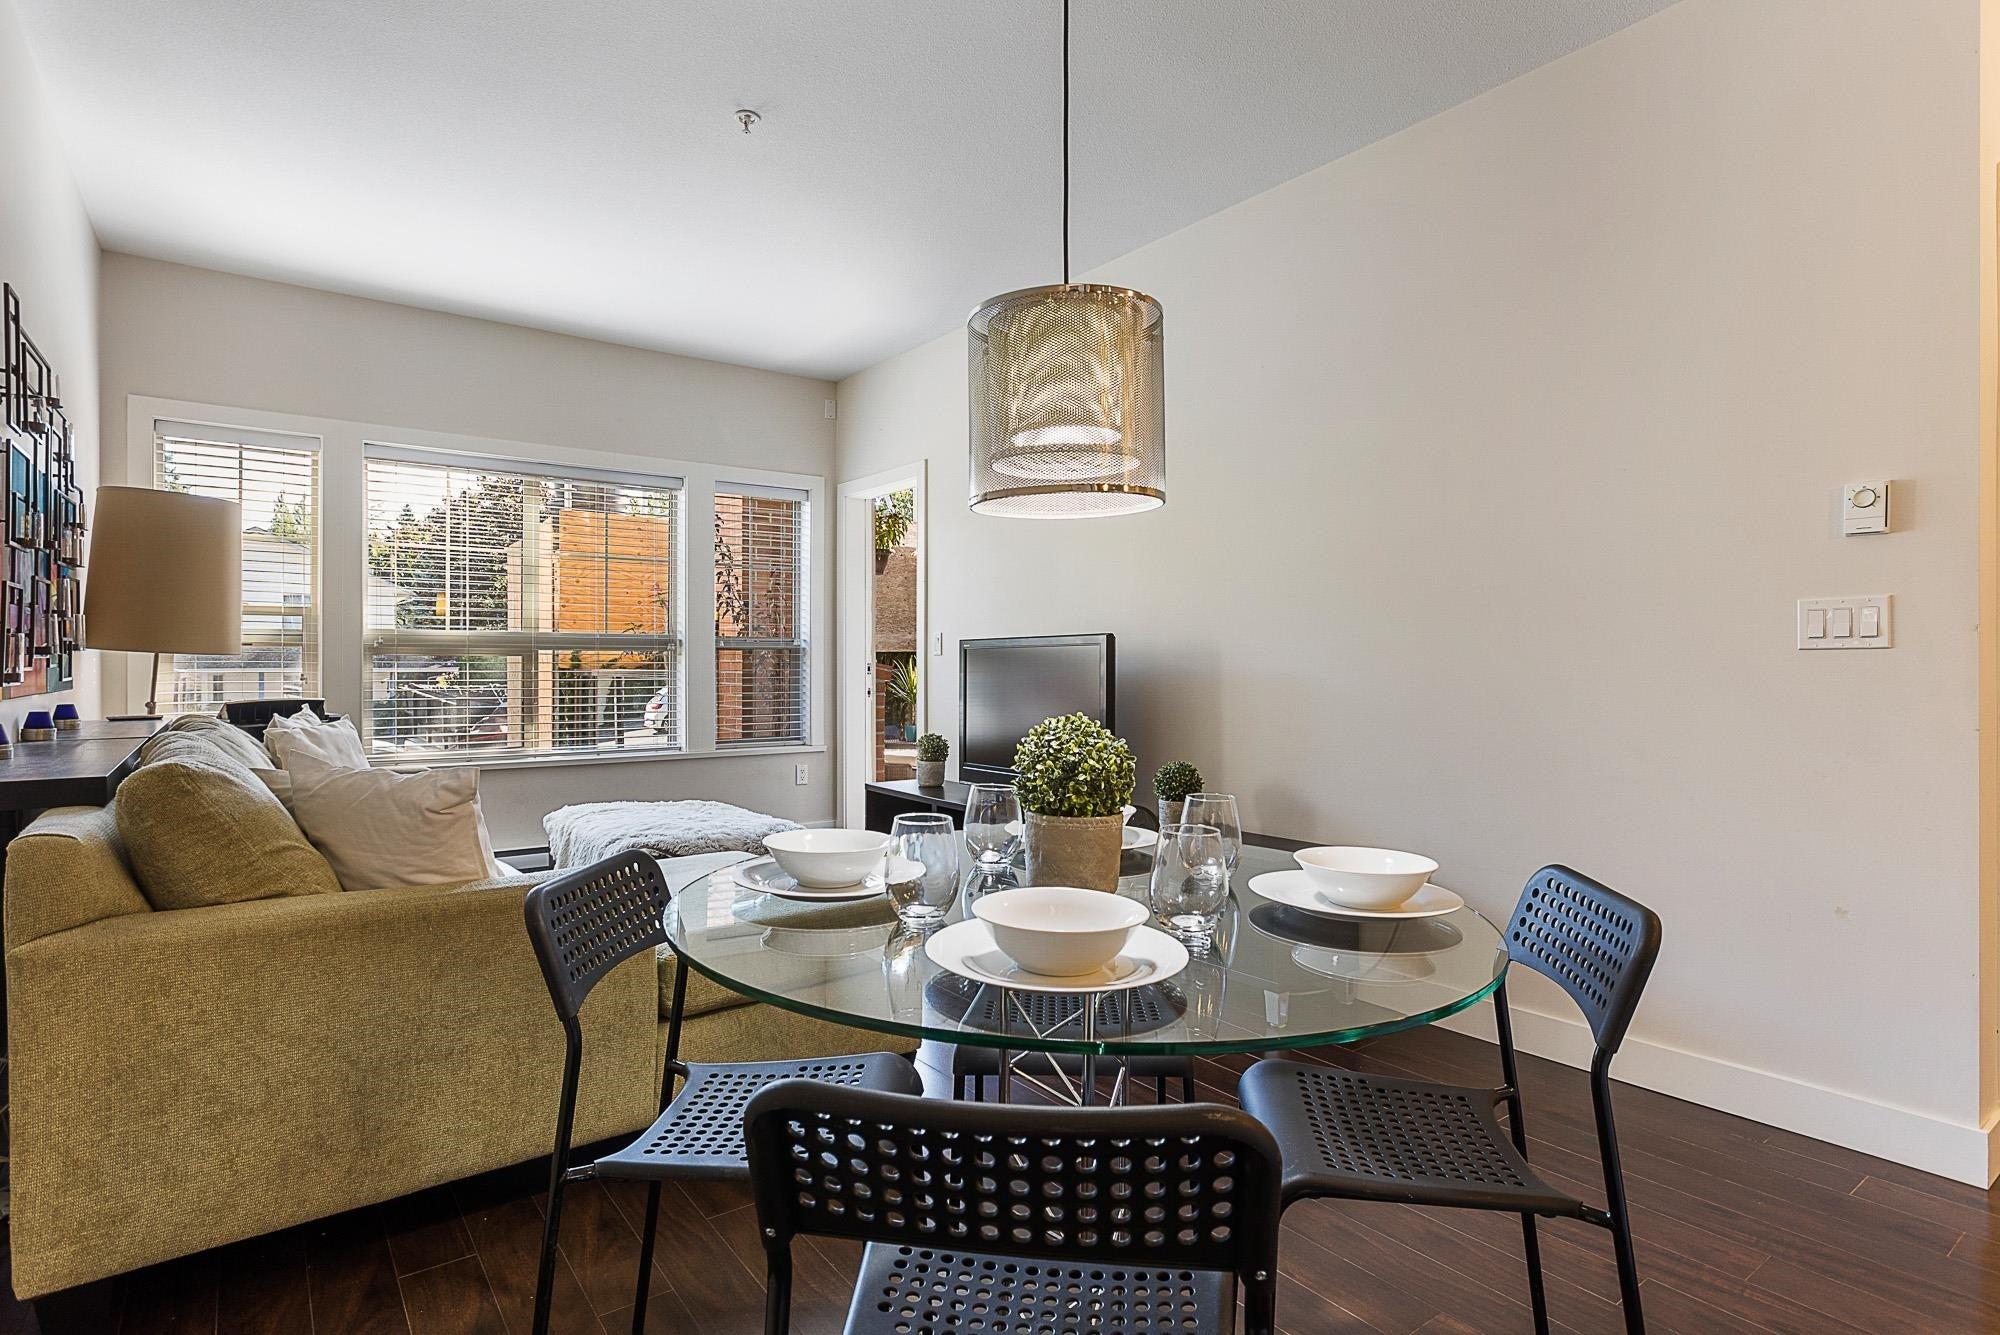 114 20219 54A AVENUE - Langley City Apartment/Condo for sale, 1 Bedroom (R2616172) - #10